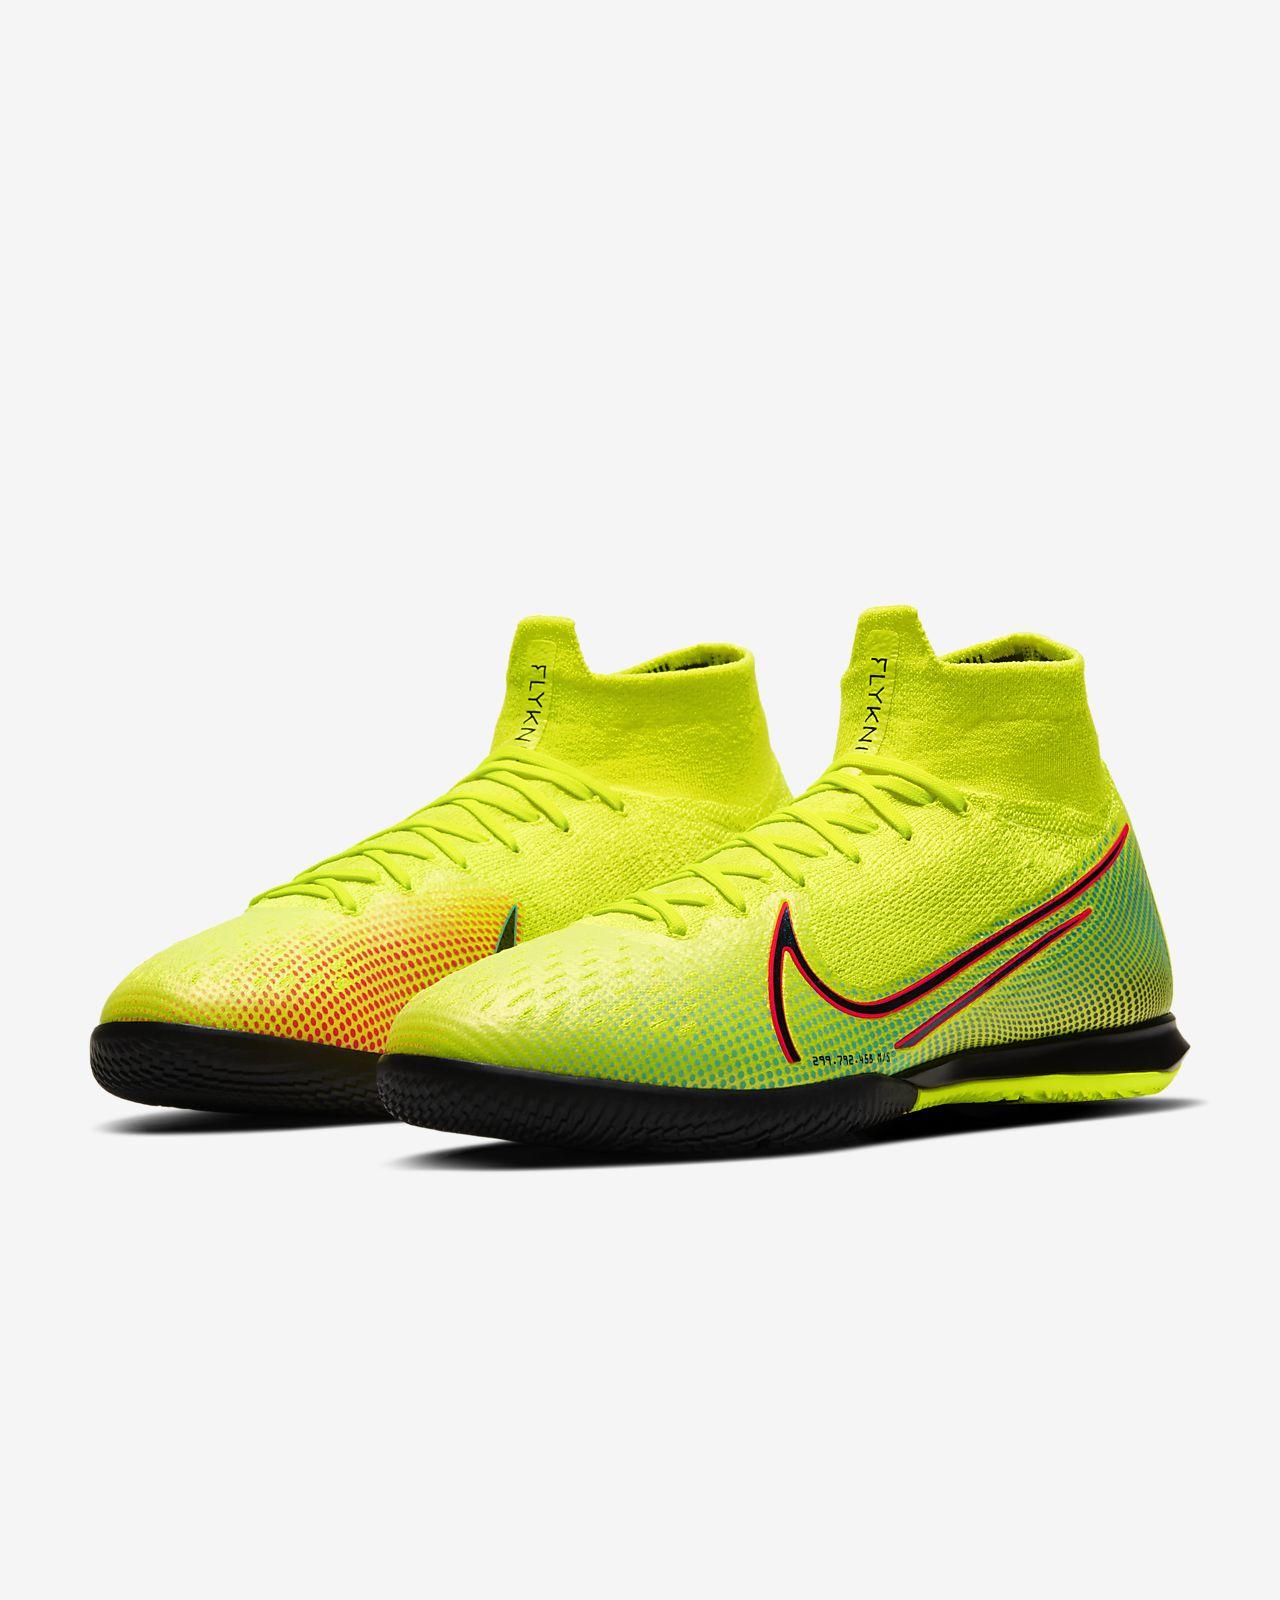 Sapatilhas de futsal Nike Mercurial Superfly 7 Elite MDS IC